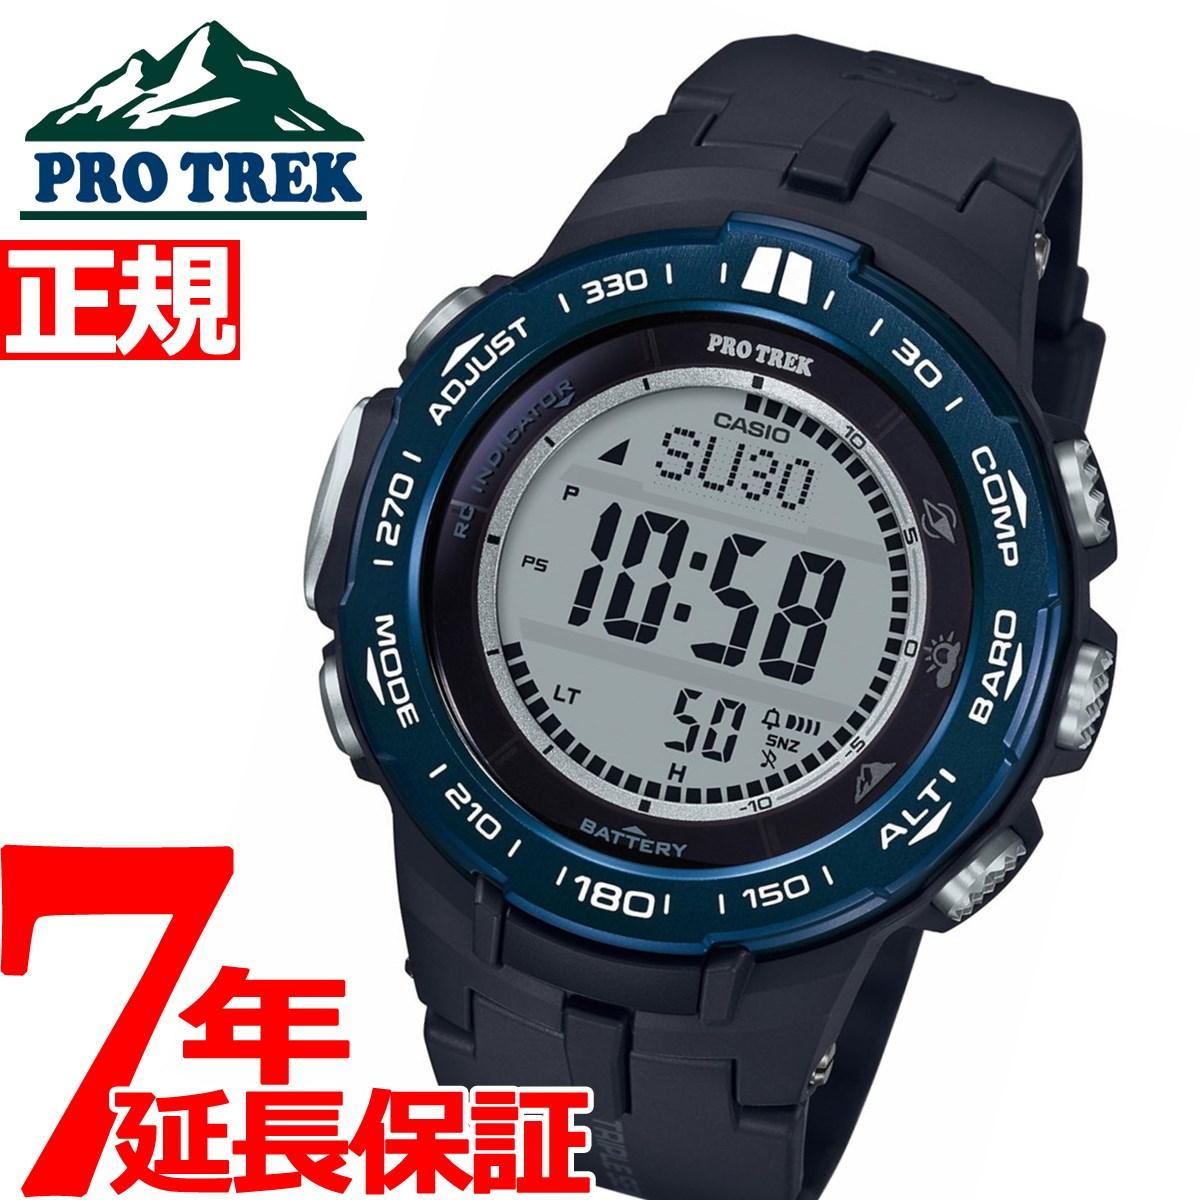 d3c41b2d46 カシオプロトレックCASIOPROTREK電波ソーラー電波時計腕時計メンズタフソーラーPRW-3100YB-